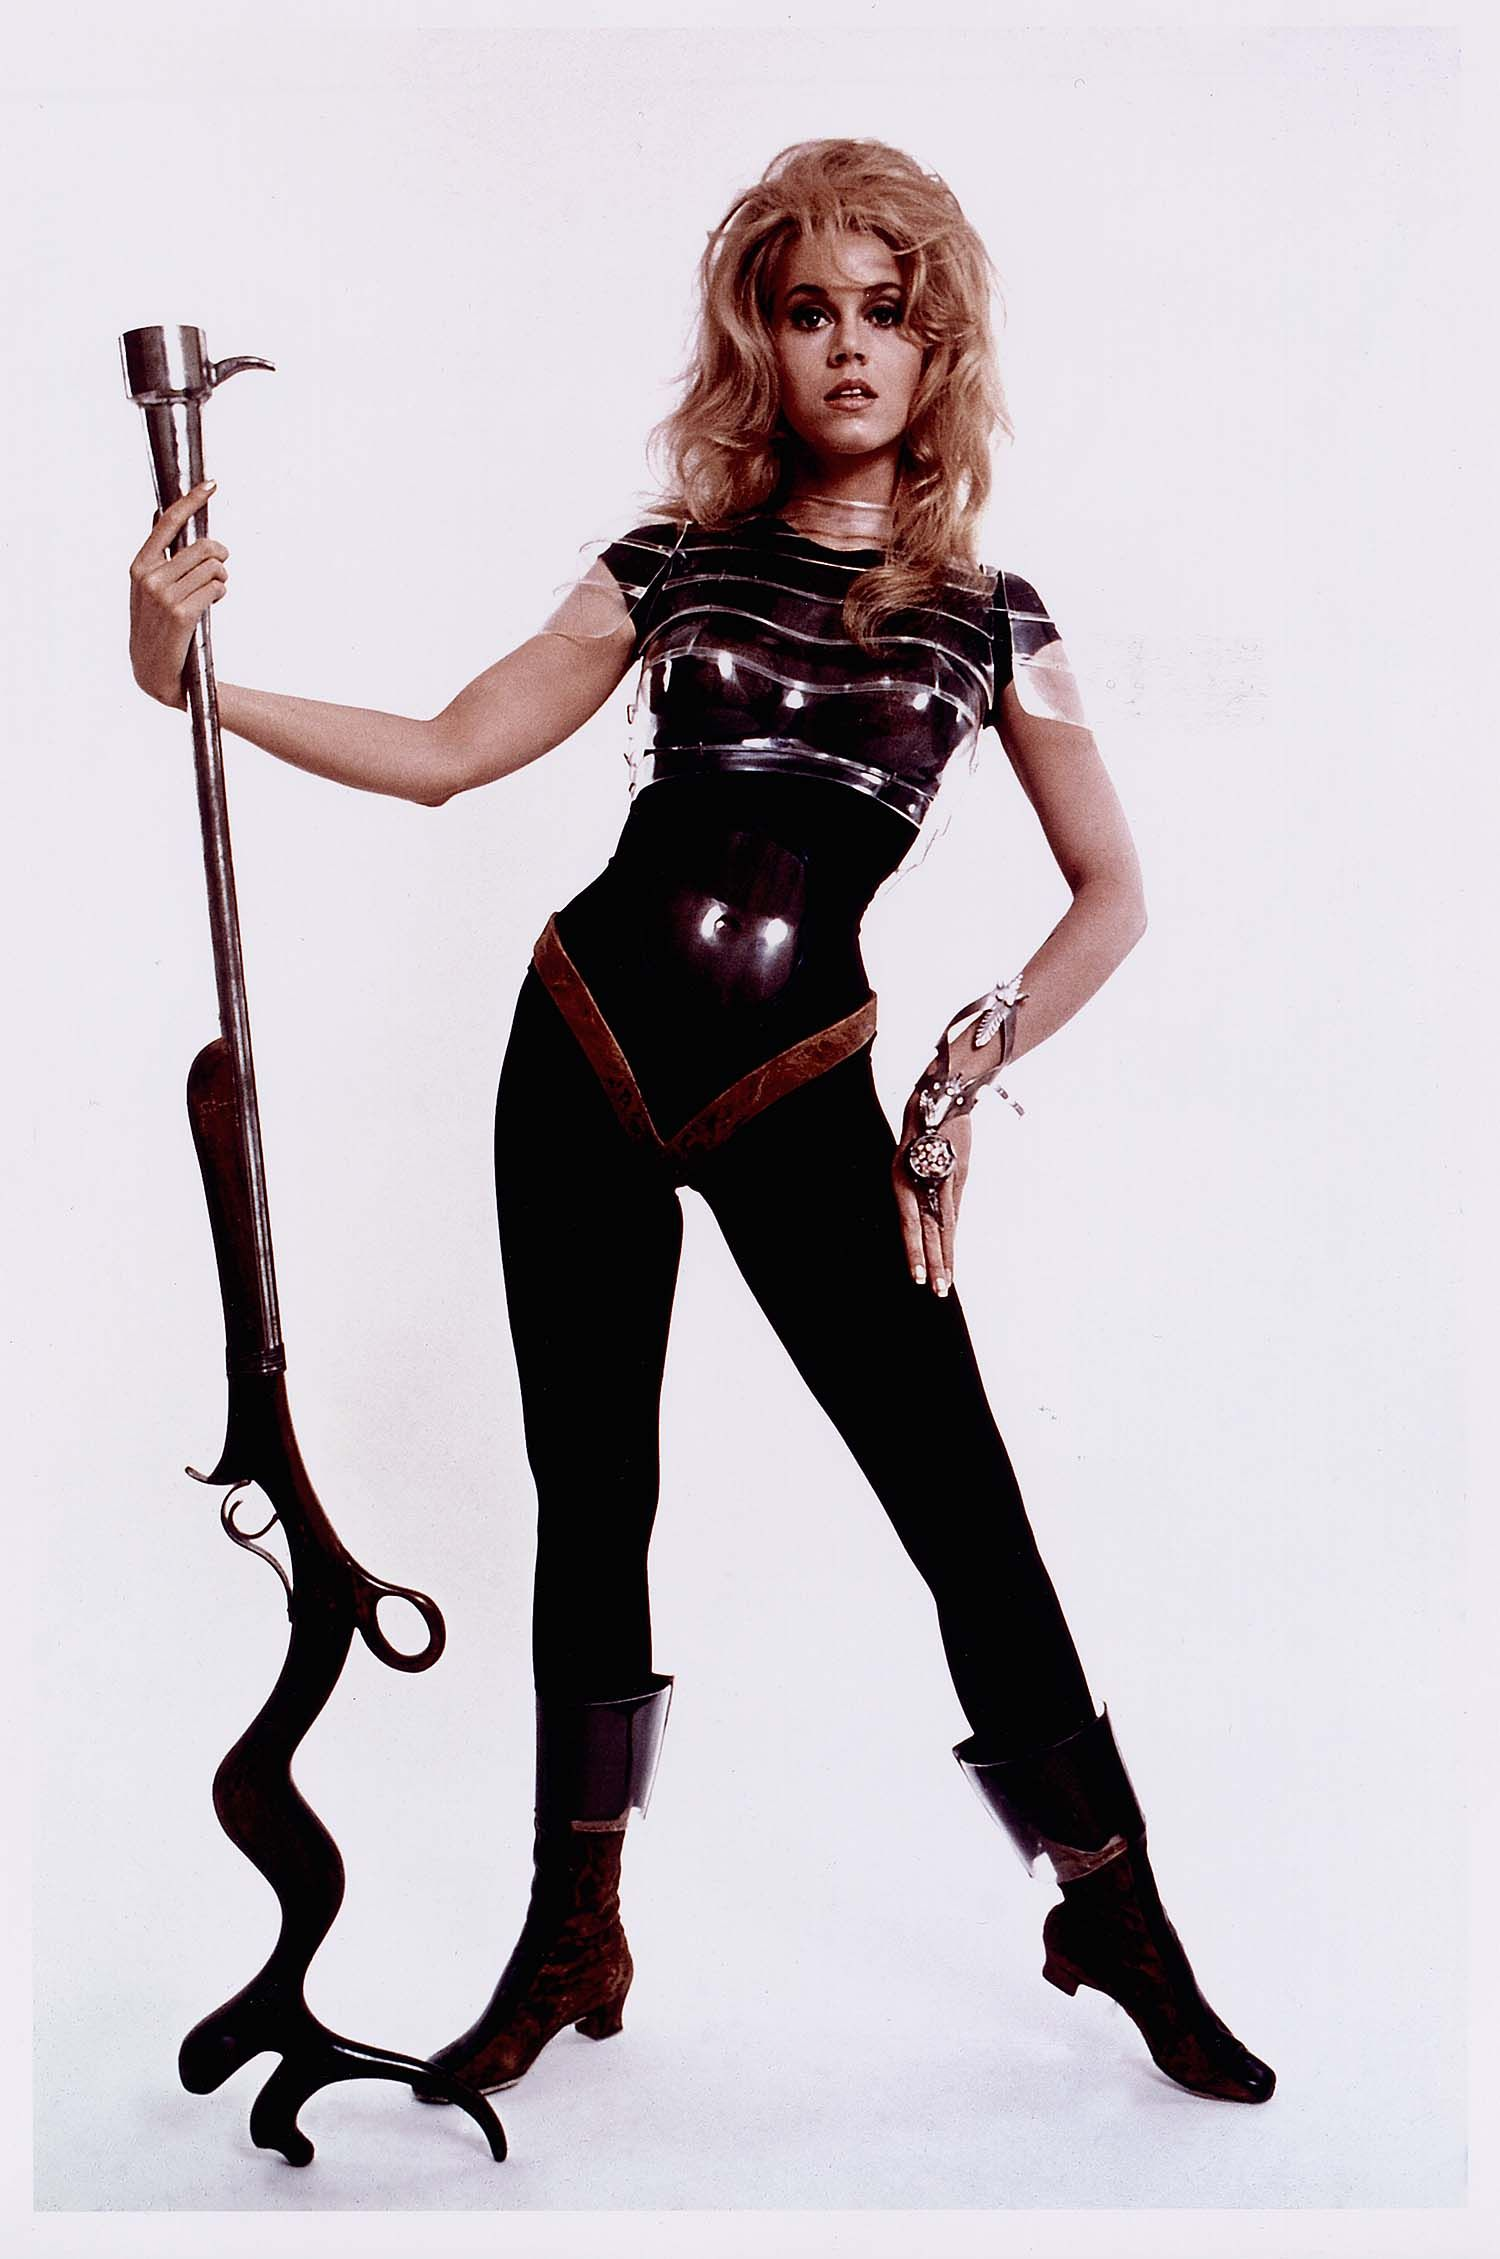 Jane Fonda In Barbarella By Roger Vadim Costumes By Paco Rabanne ジェーン フォンダ バーバレラ ワンダーウーマン